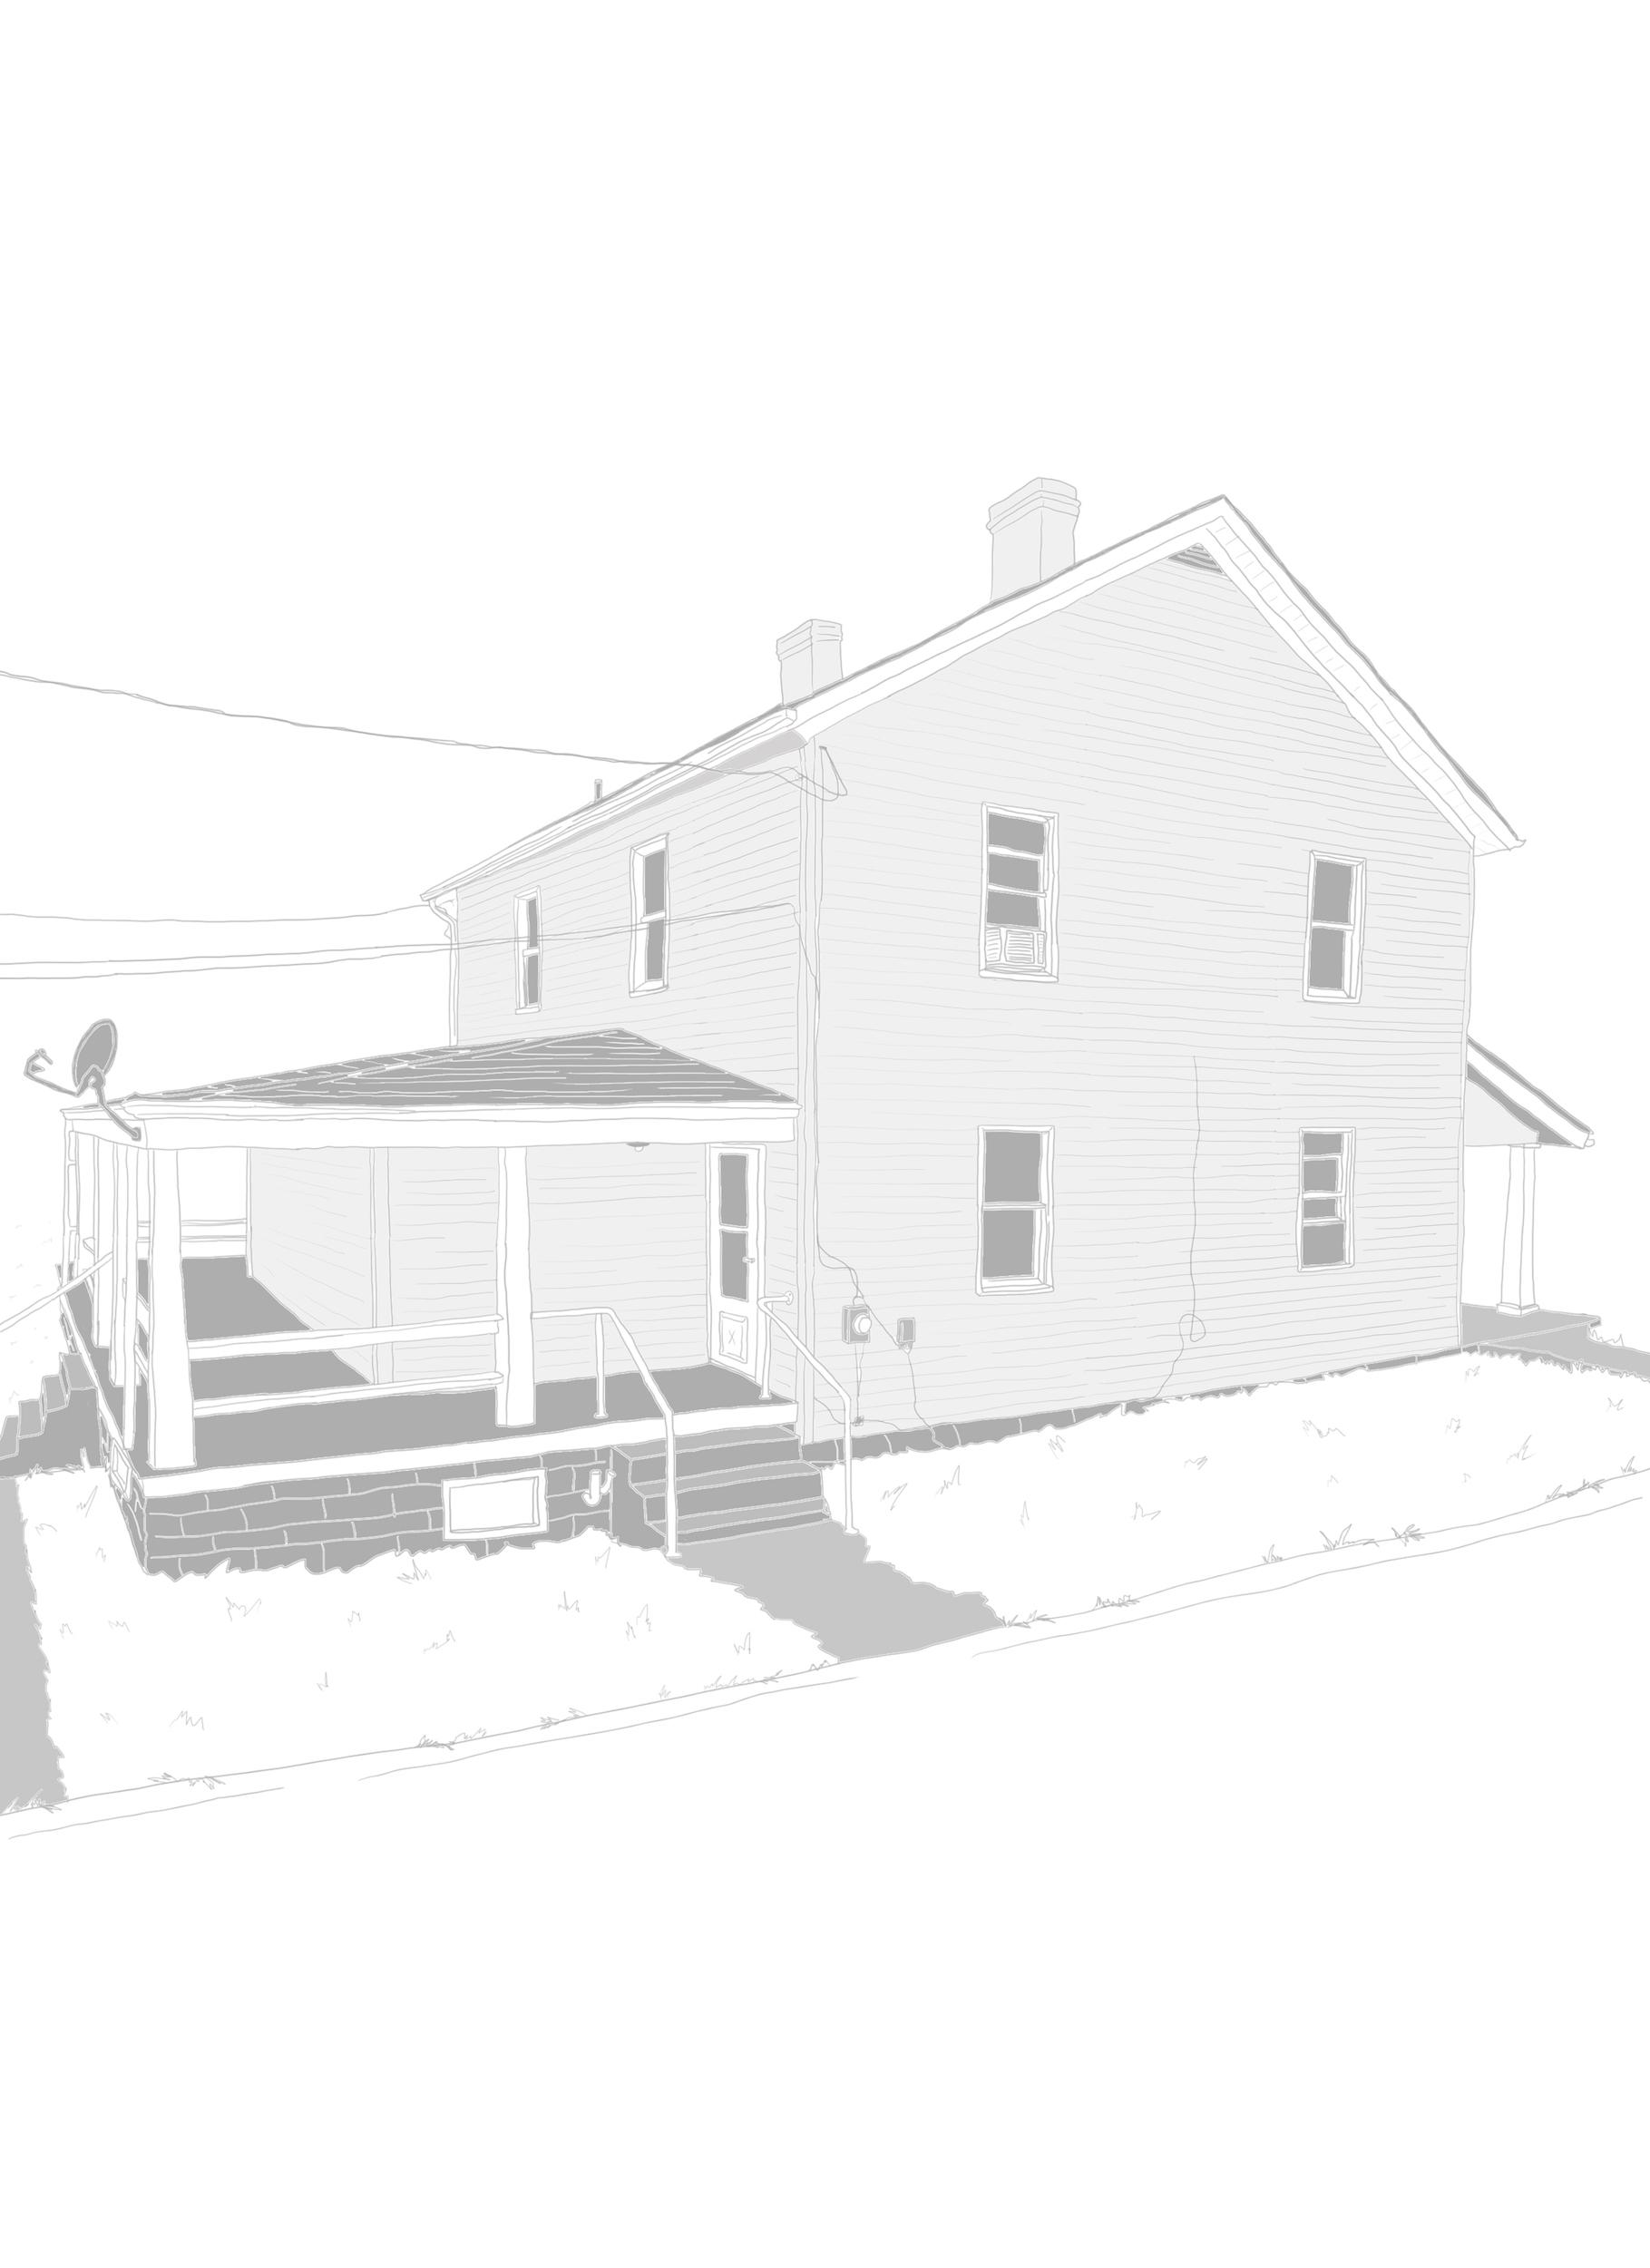 patchhouse.jpg